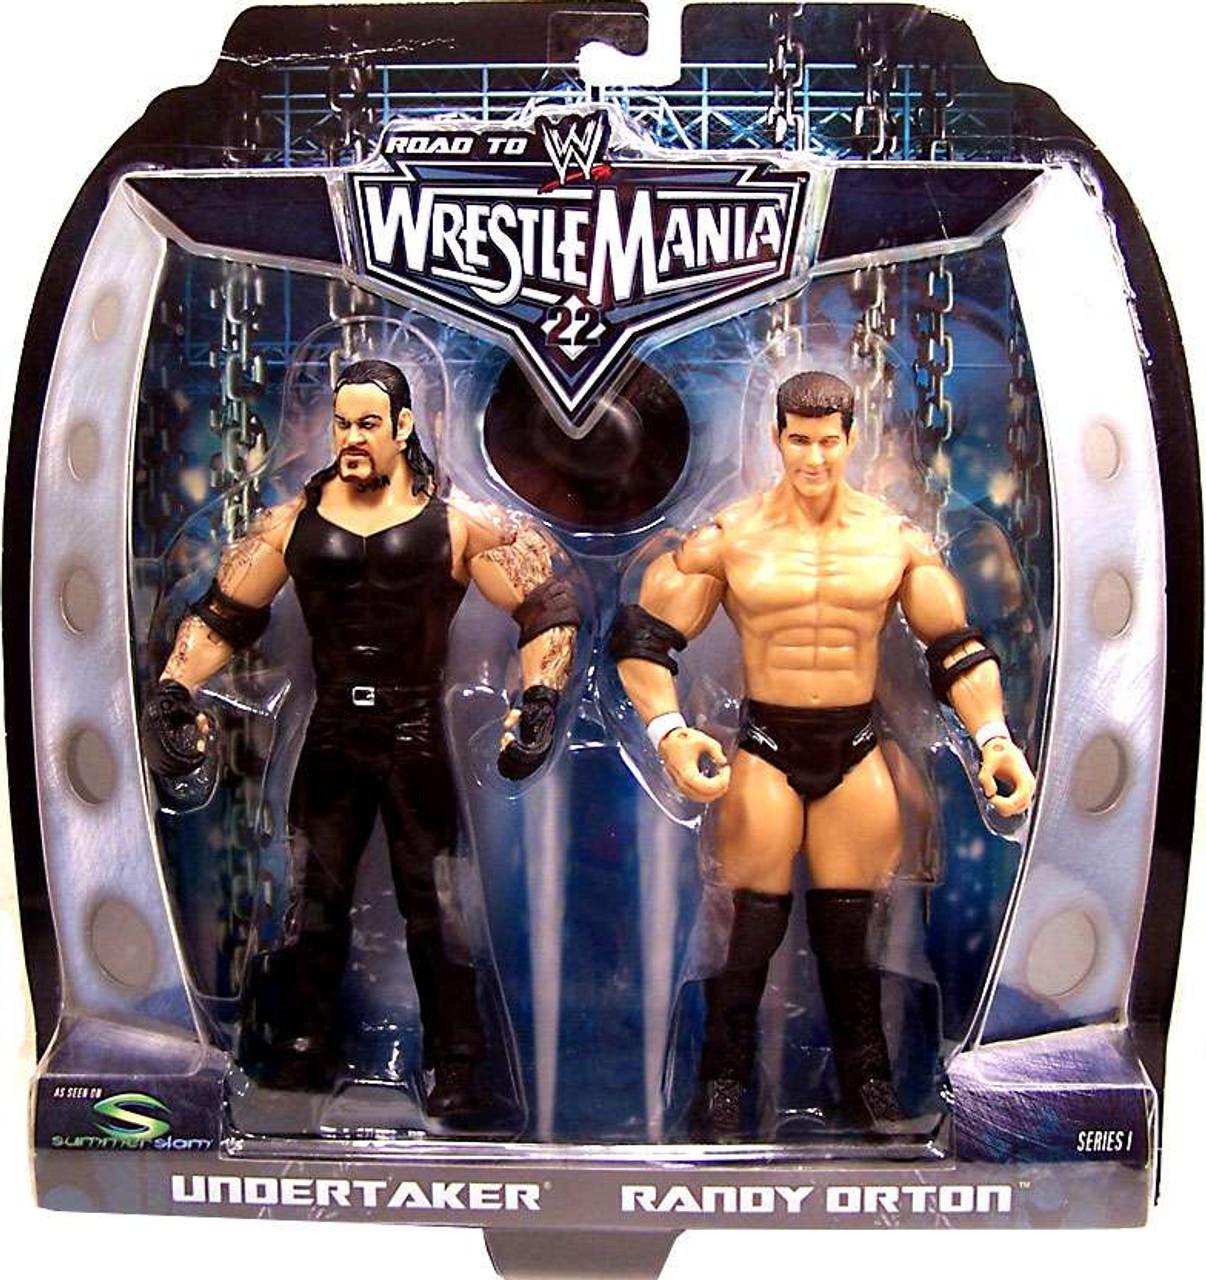 WWE Wrestling Road to WrestleMania 22 Series 1 Randy Orton vs. Undertaker Action Figure 2-Pack